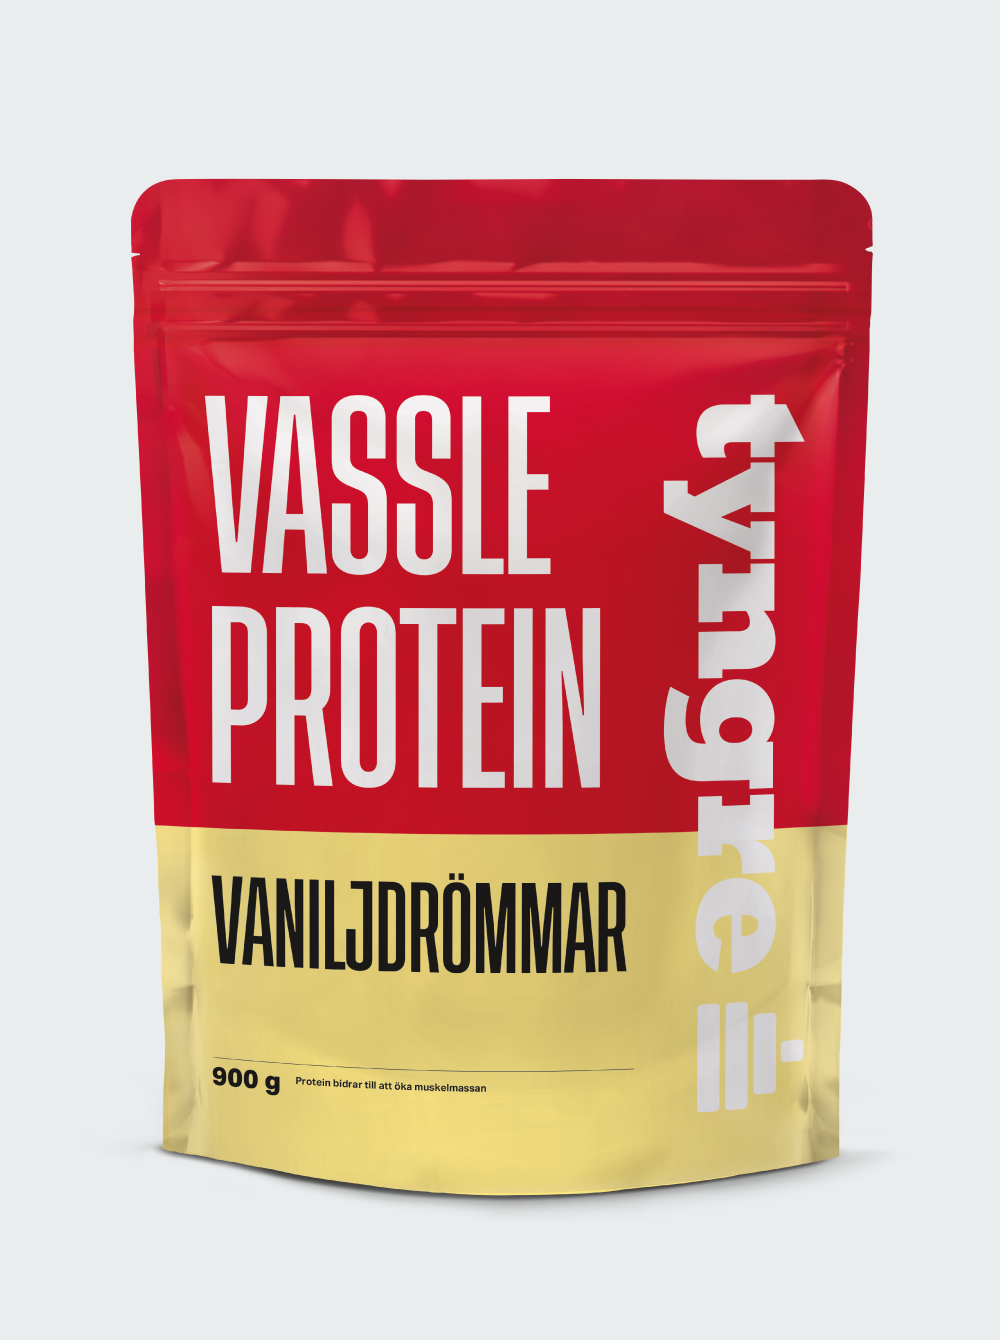 Tyngre Vassleprotein - Vaniljdrömmar 900g